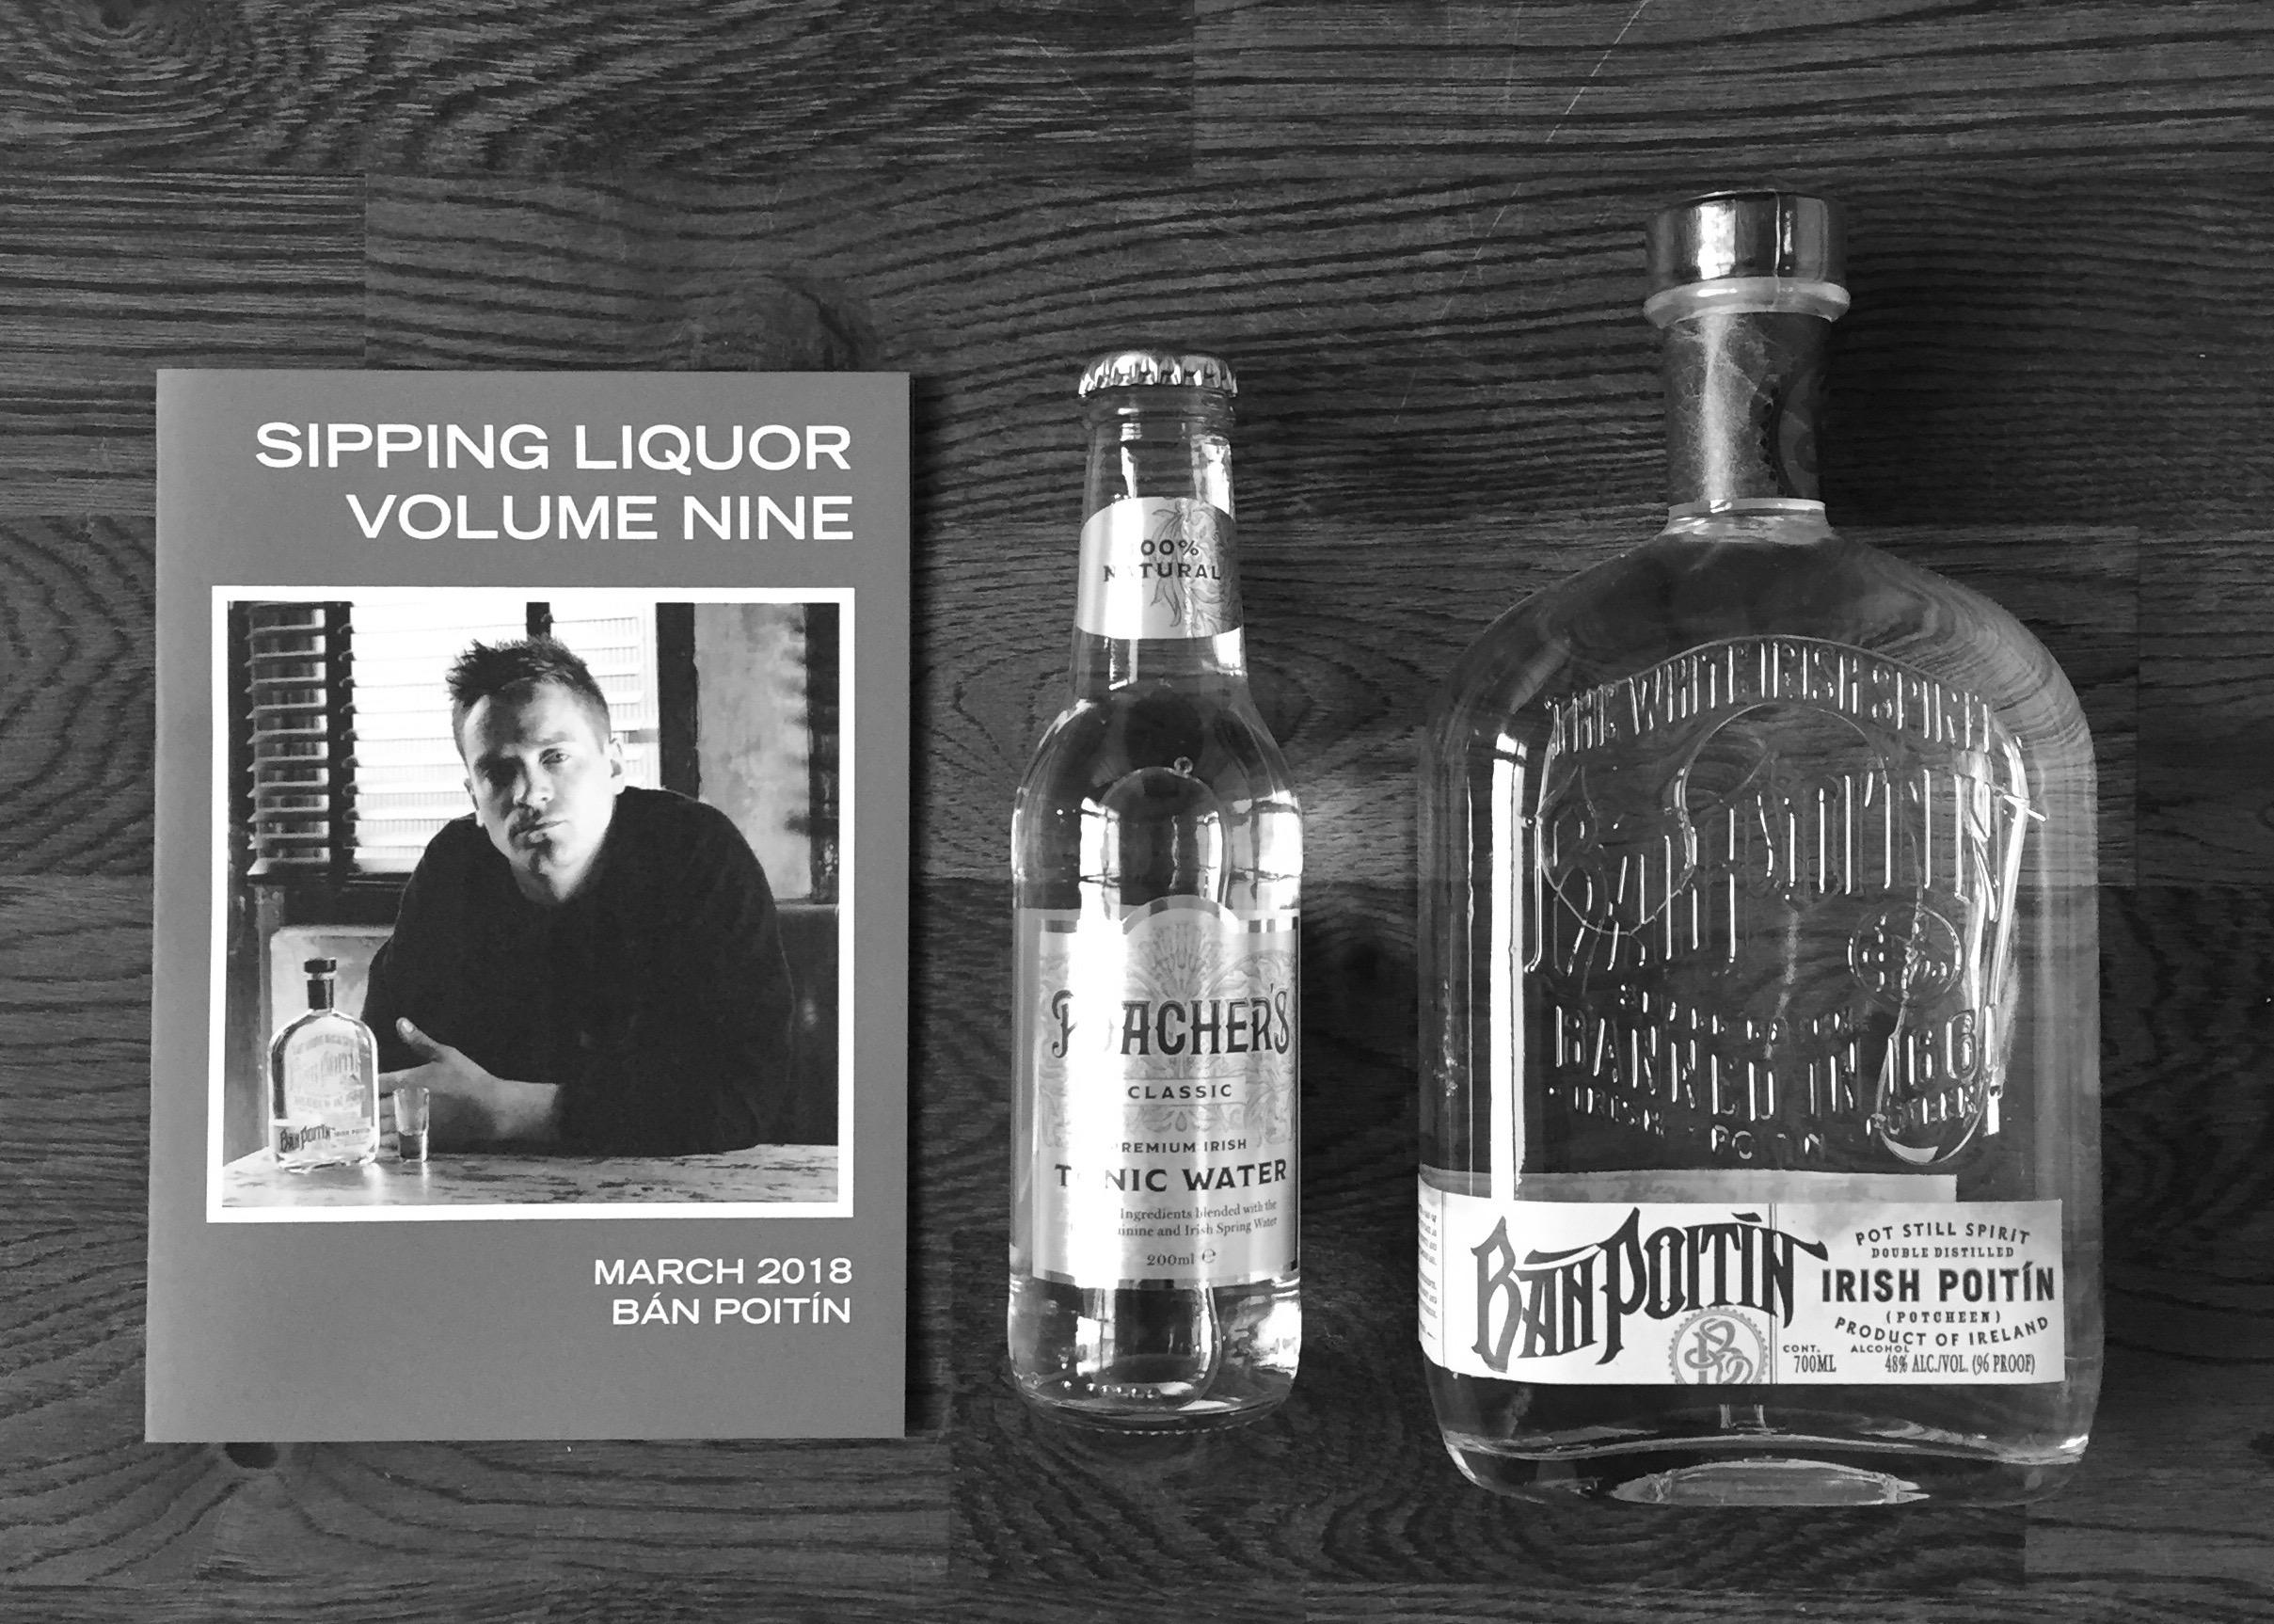 Sipping Liquor box with Ban Poitin and Poacher's Tonic